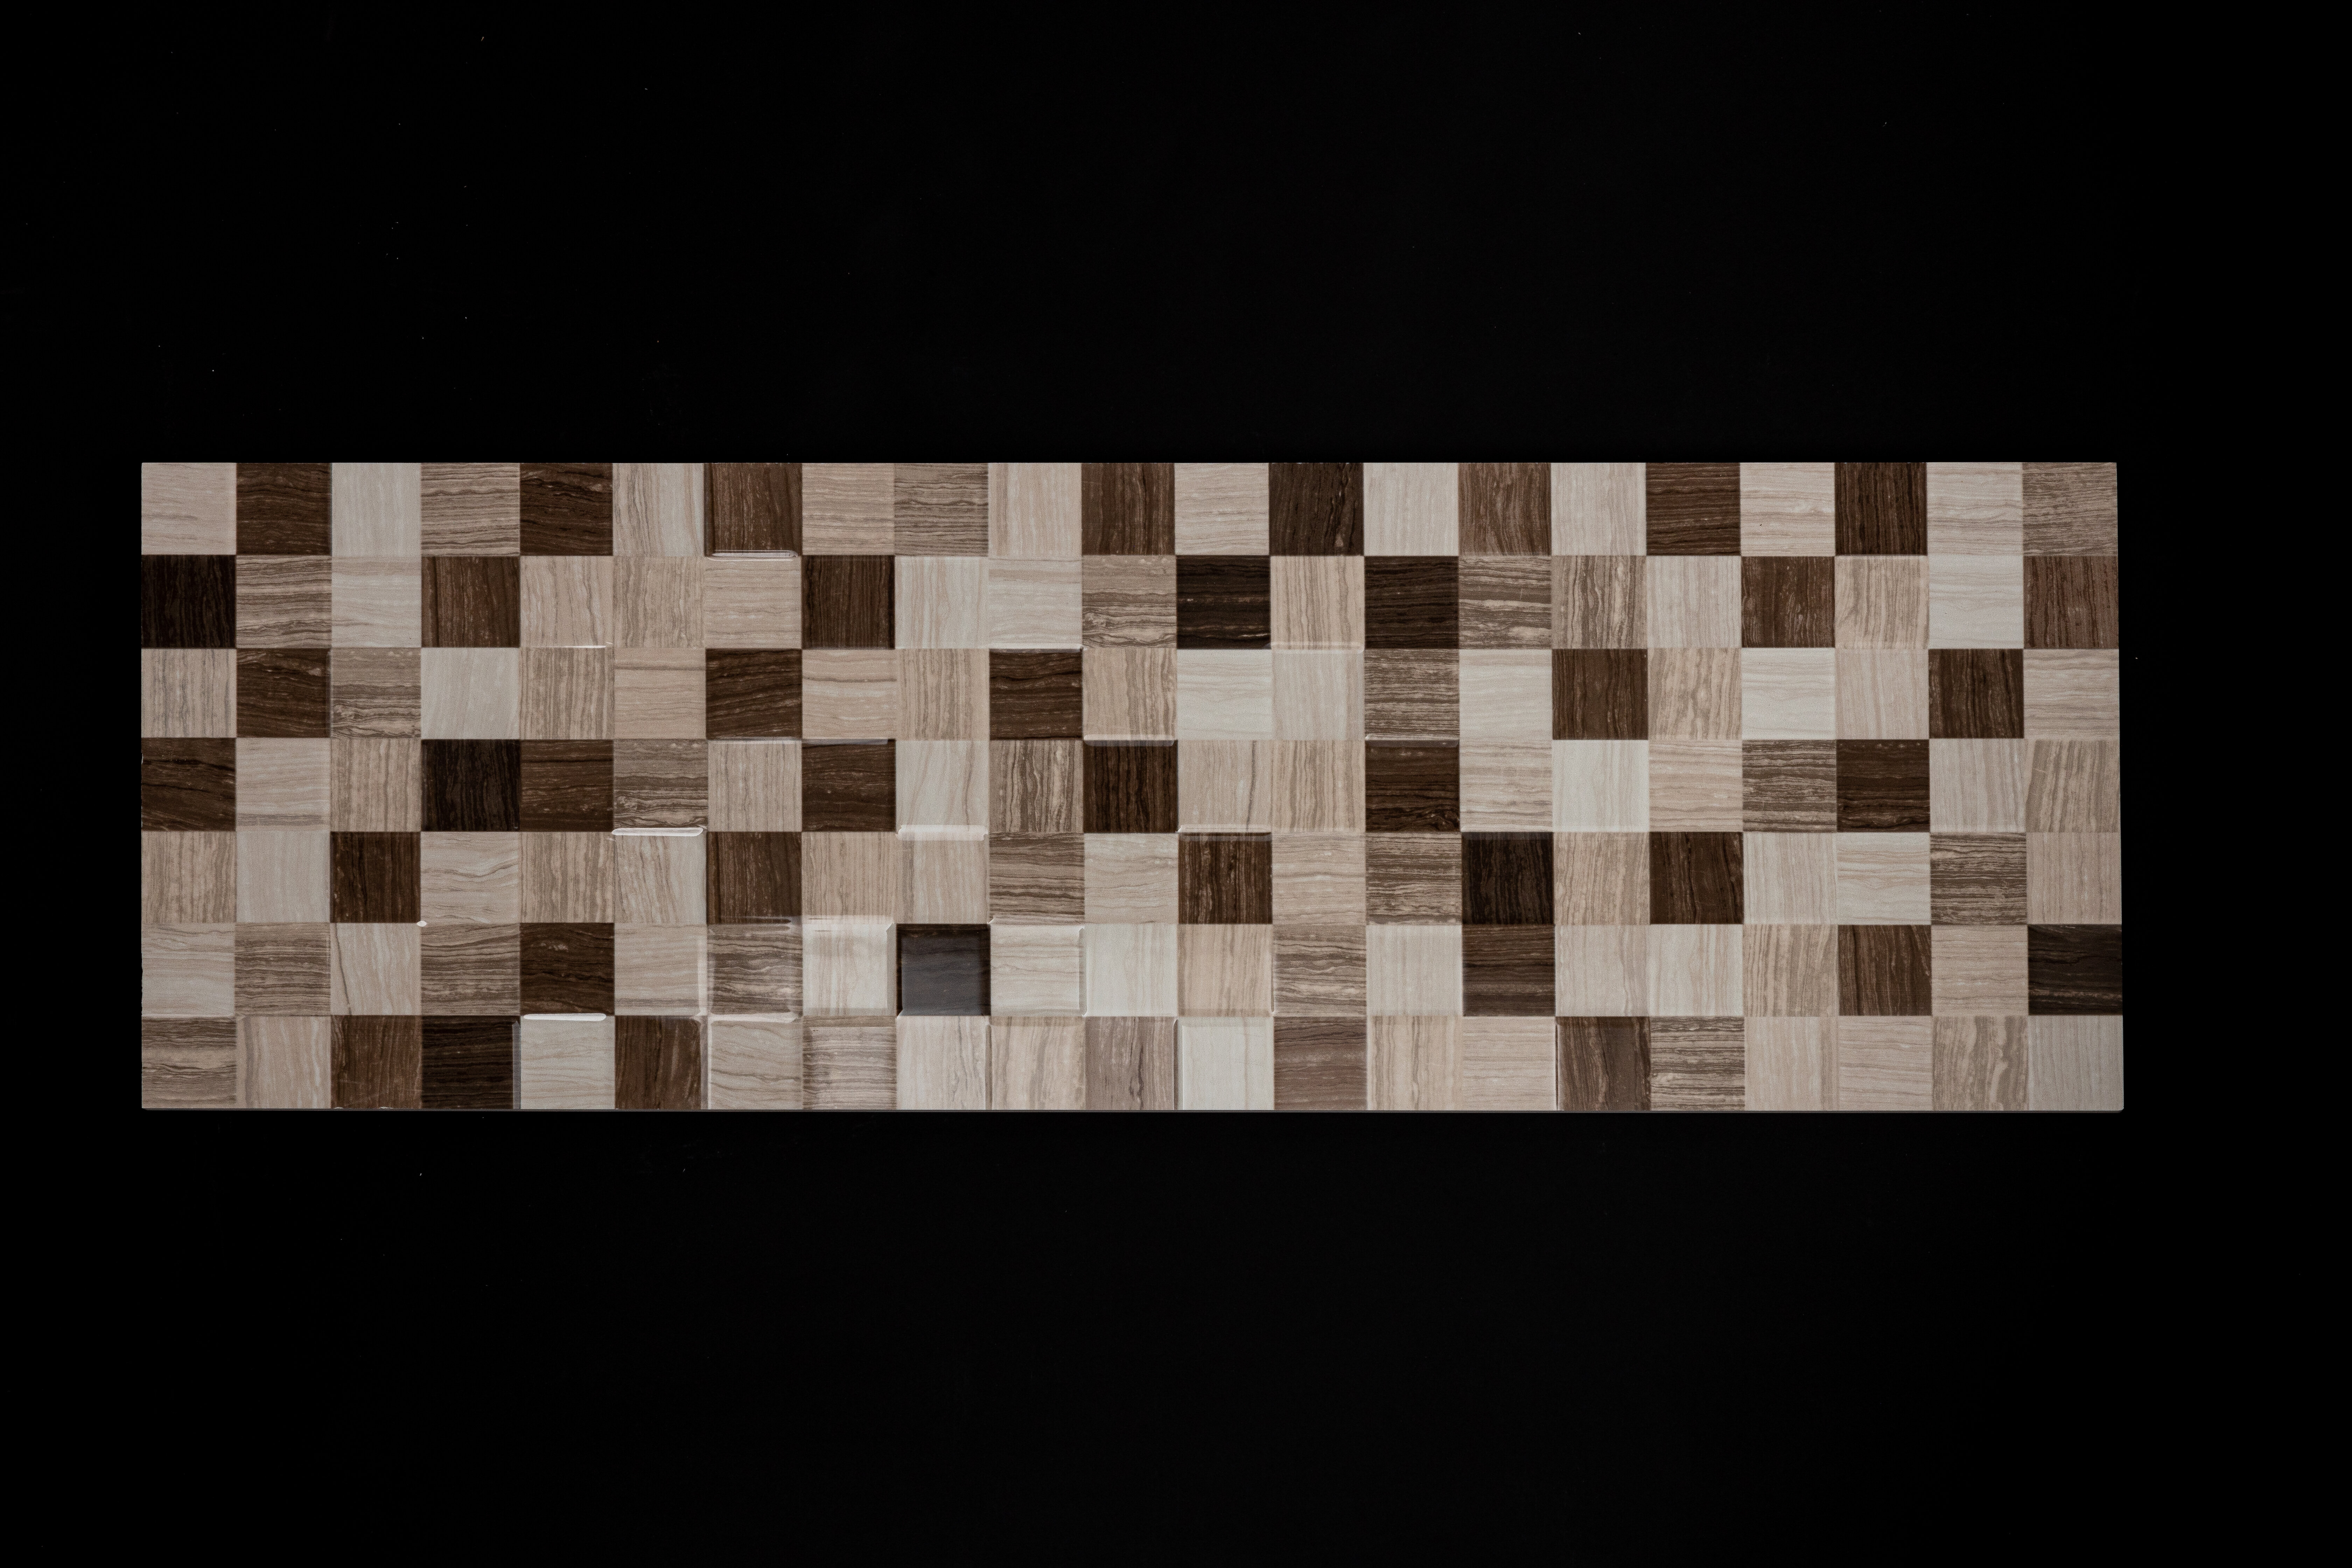 Walkon Tile Woodlook 12 X 36 Ceramic Wood Look Tile Wayfair